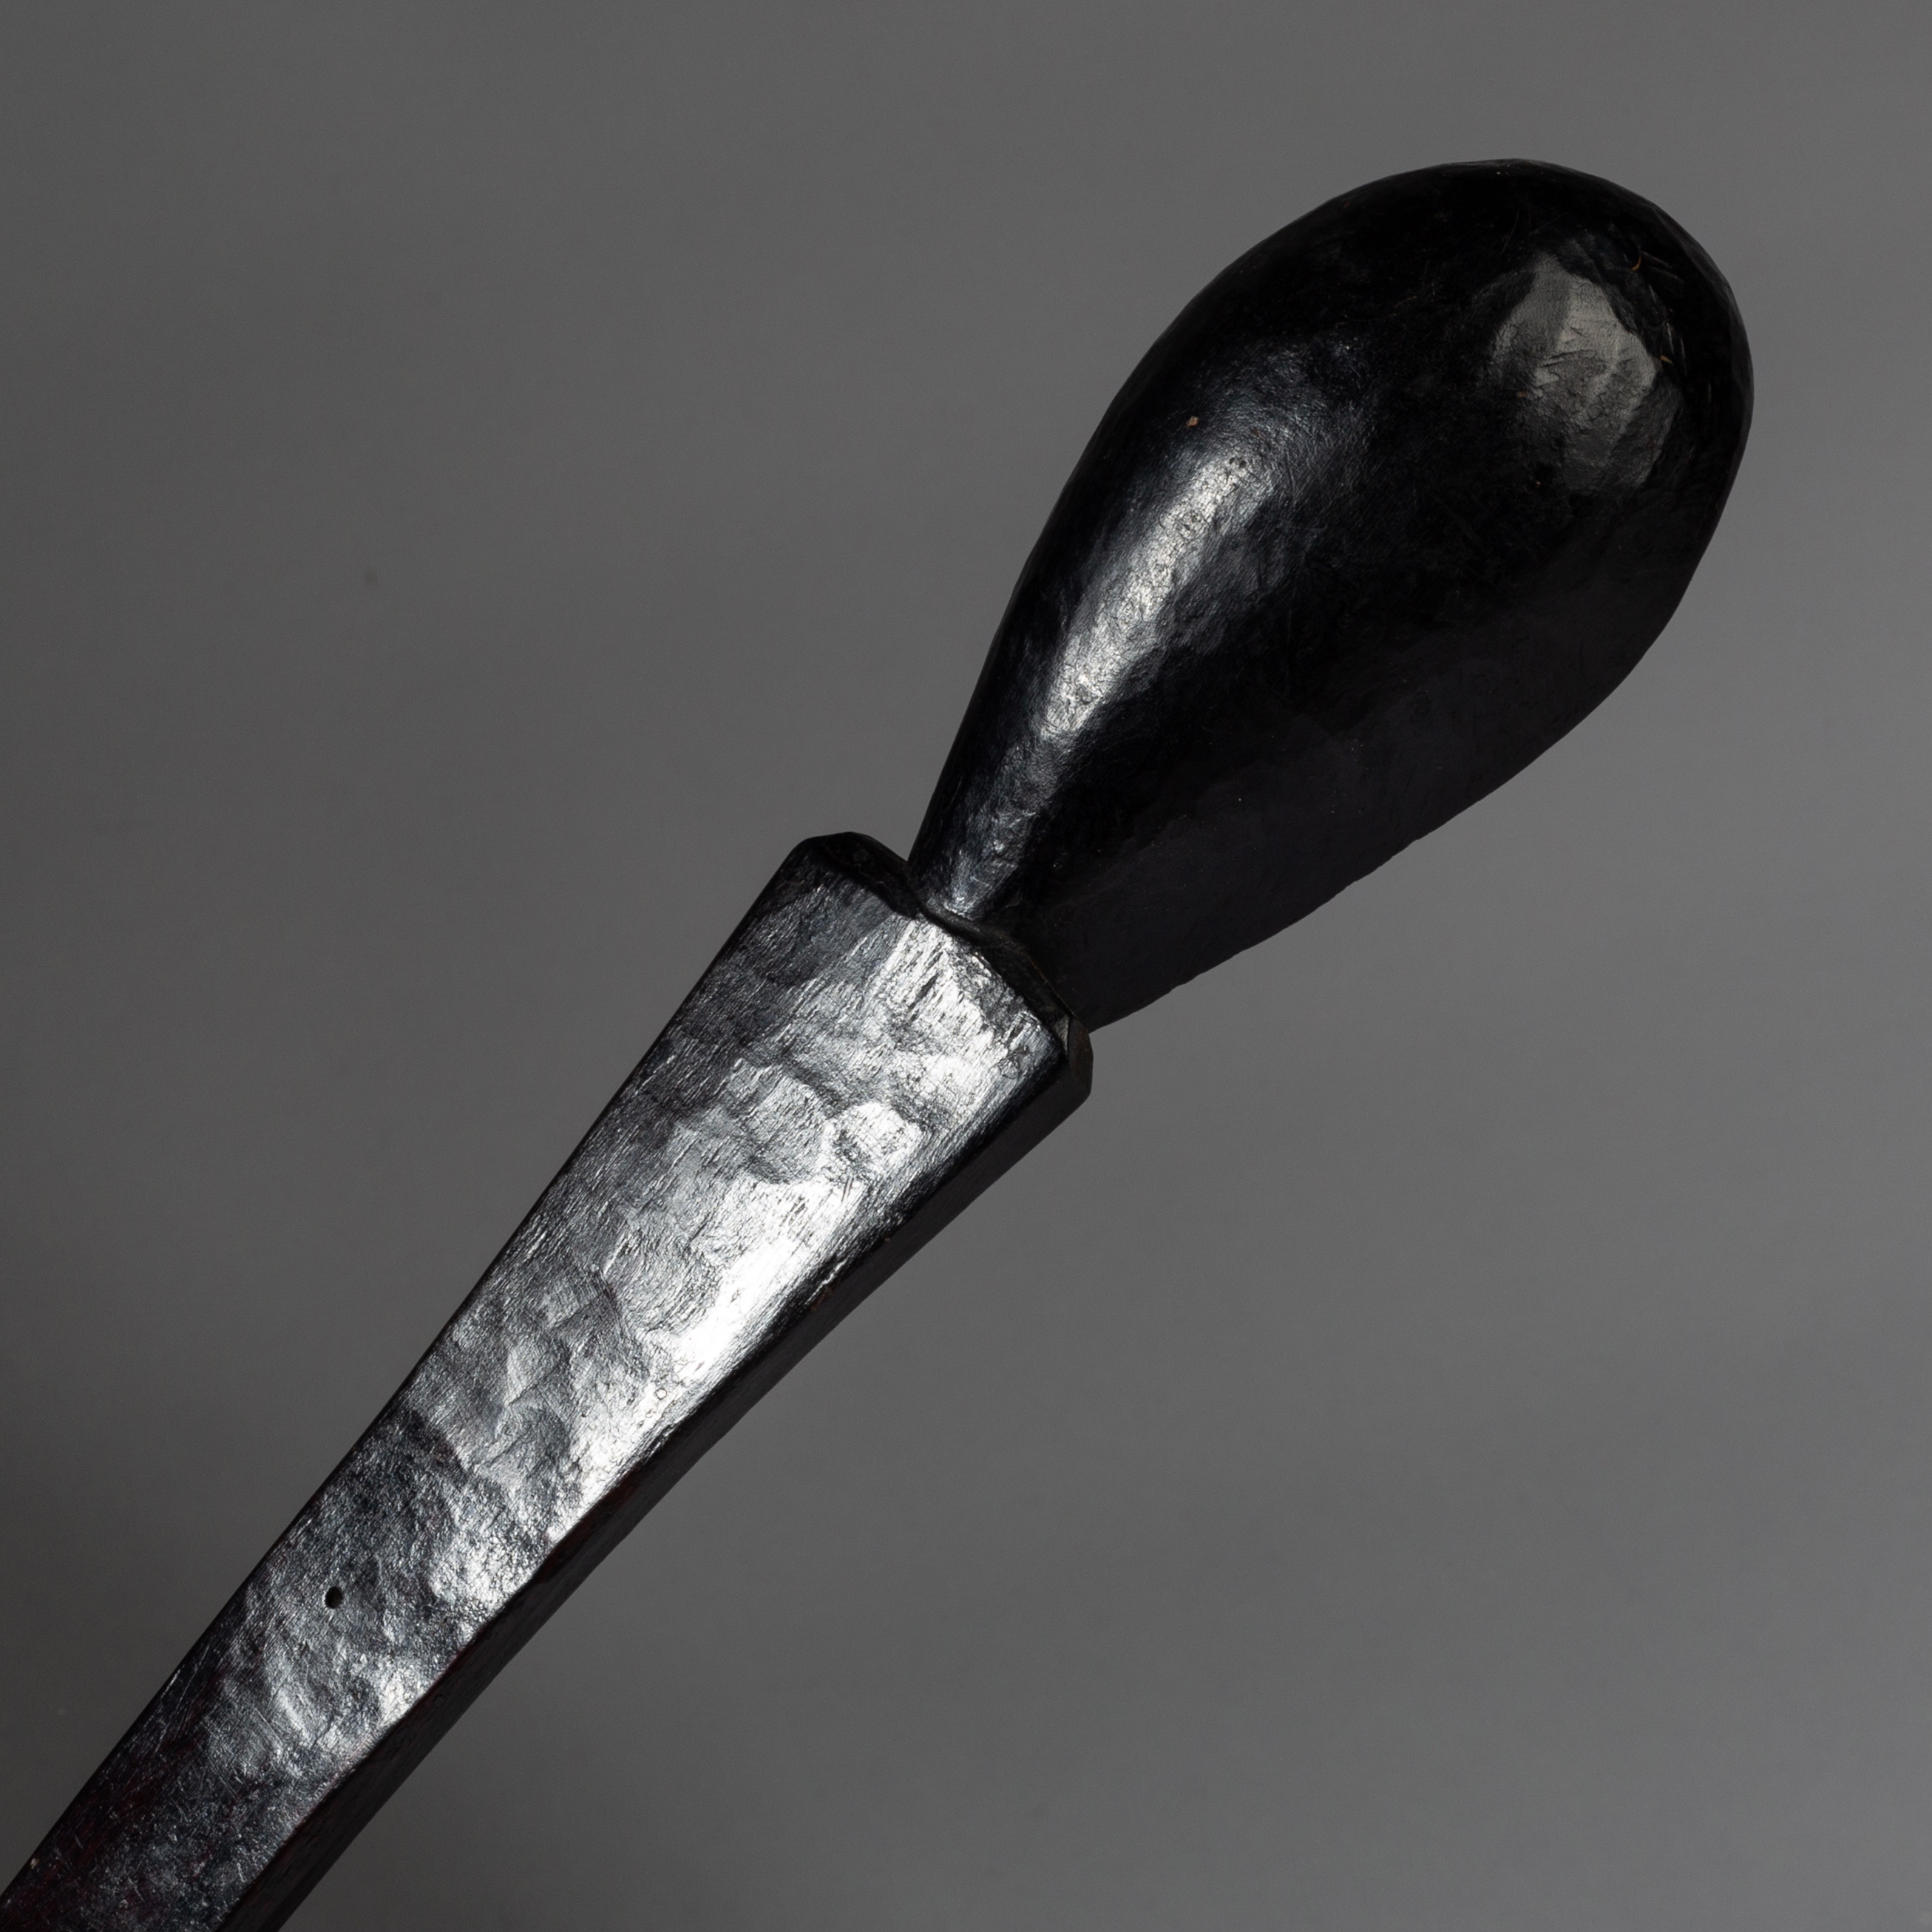 A JET BLACK SOPHISTICATED SPOON, BORANA TRIBE ETHIOPIA ( No 3260 )